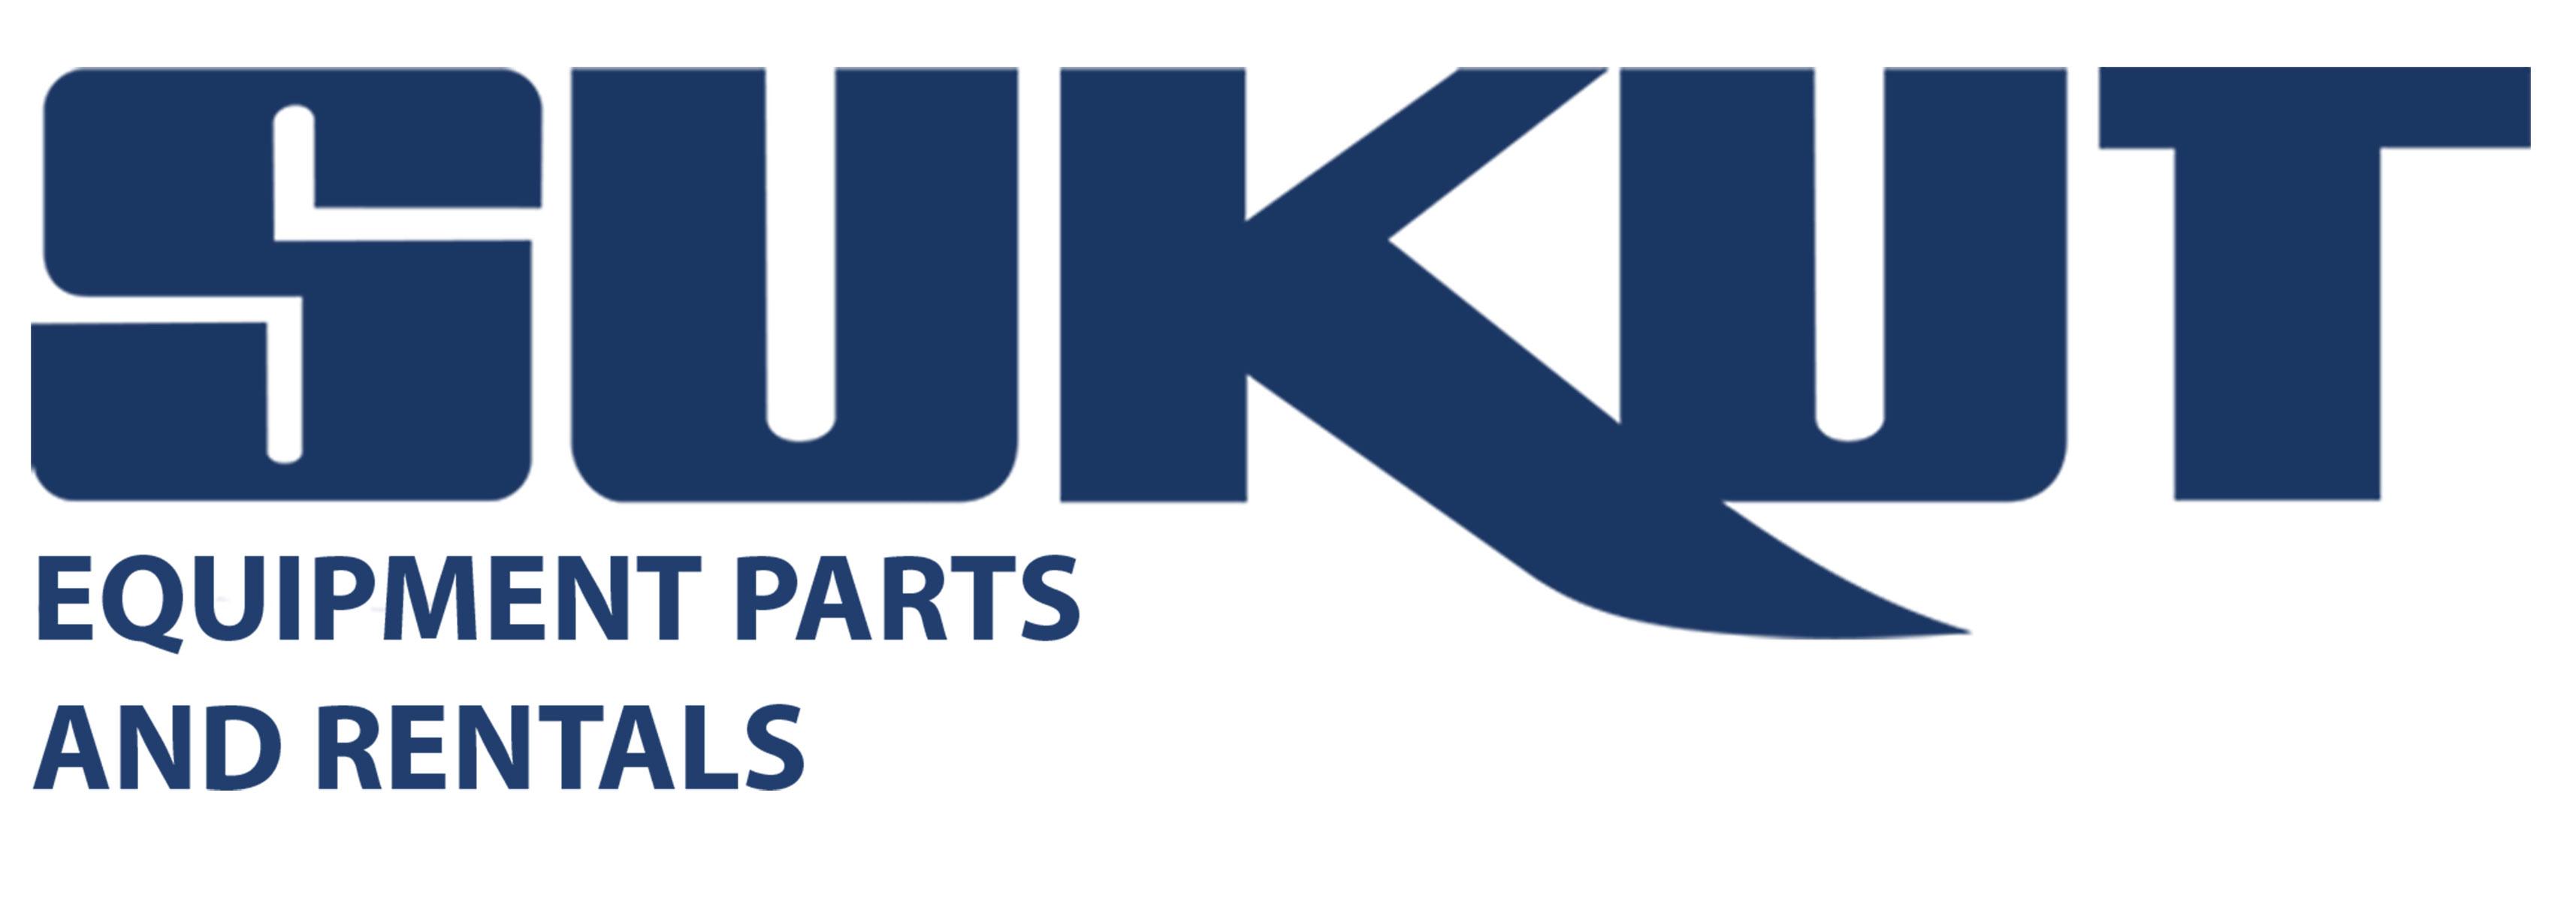 Sukut Equipment Inc. company logo